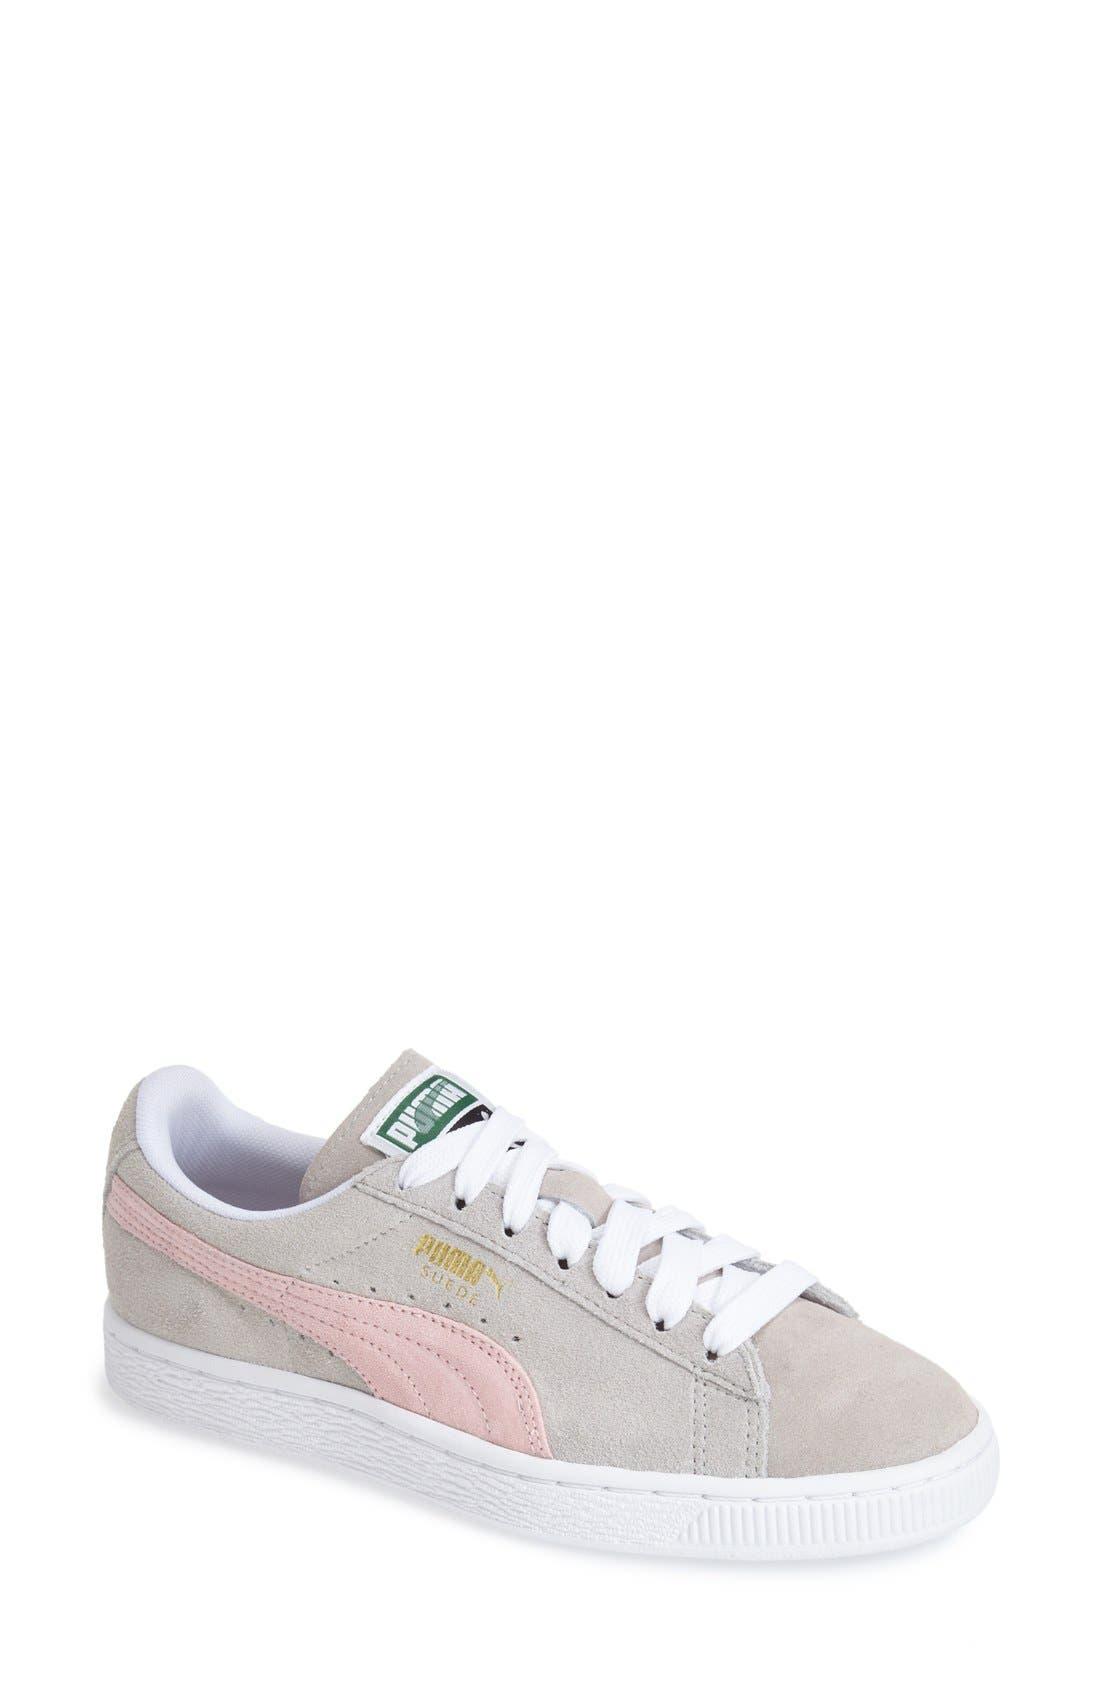 Main Image - PUMA 'Classic' Suede Sneaker (Women)